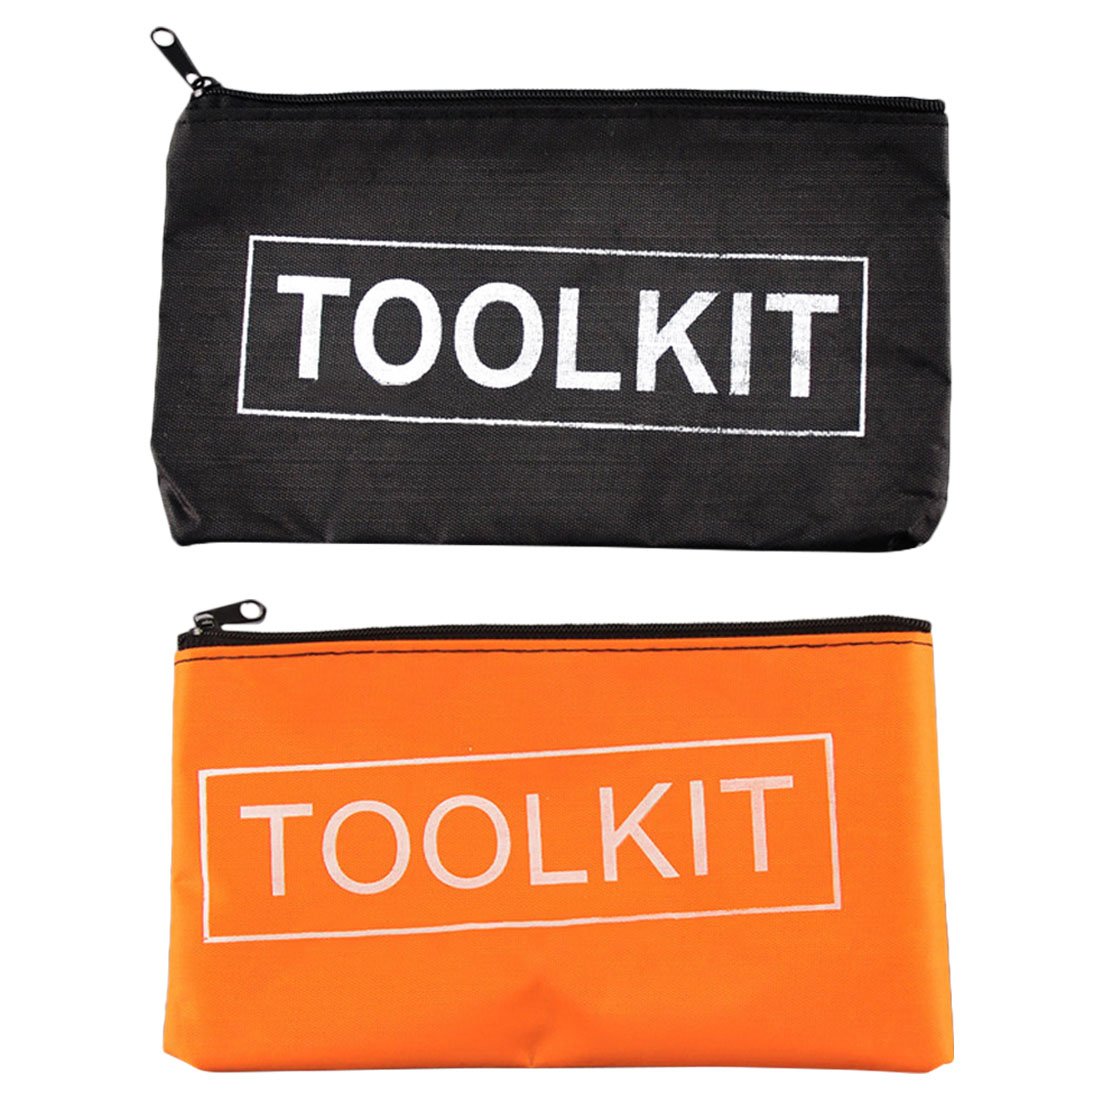 19x11cm Universal Size Convenient Hand Tool Bag Pocket Mini Tool Kit Bag 600D Oxford Cloth Tool Bag Storage Instrument Case